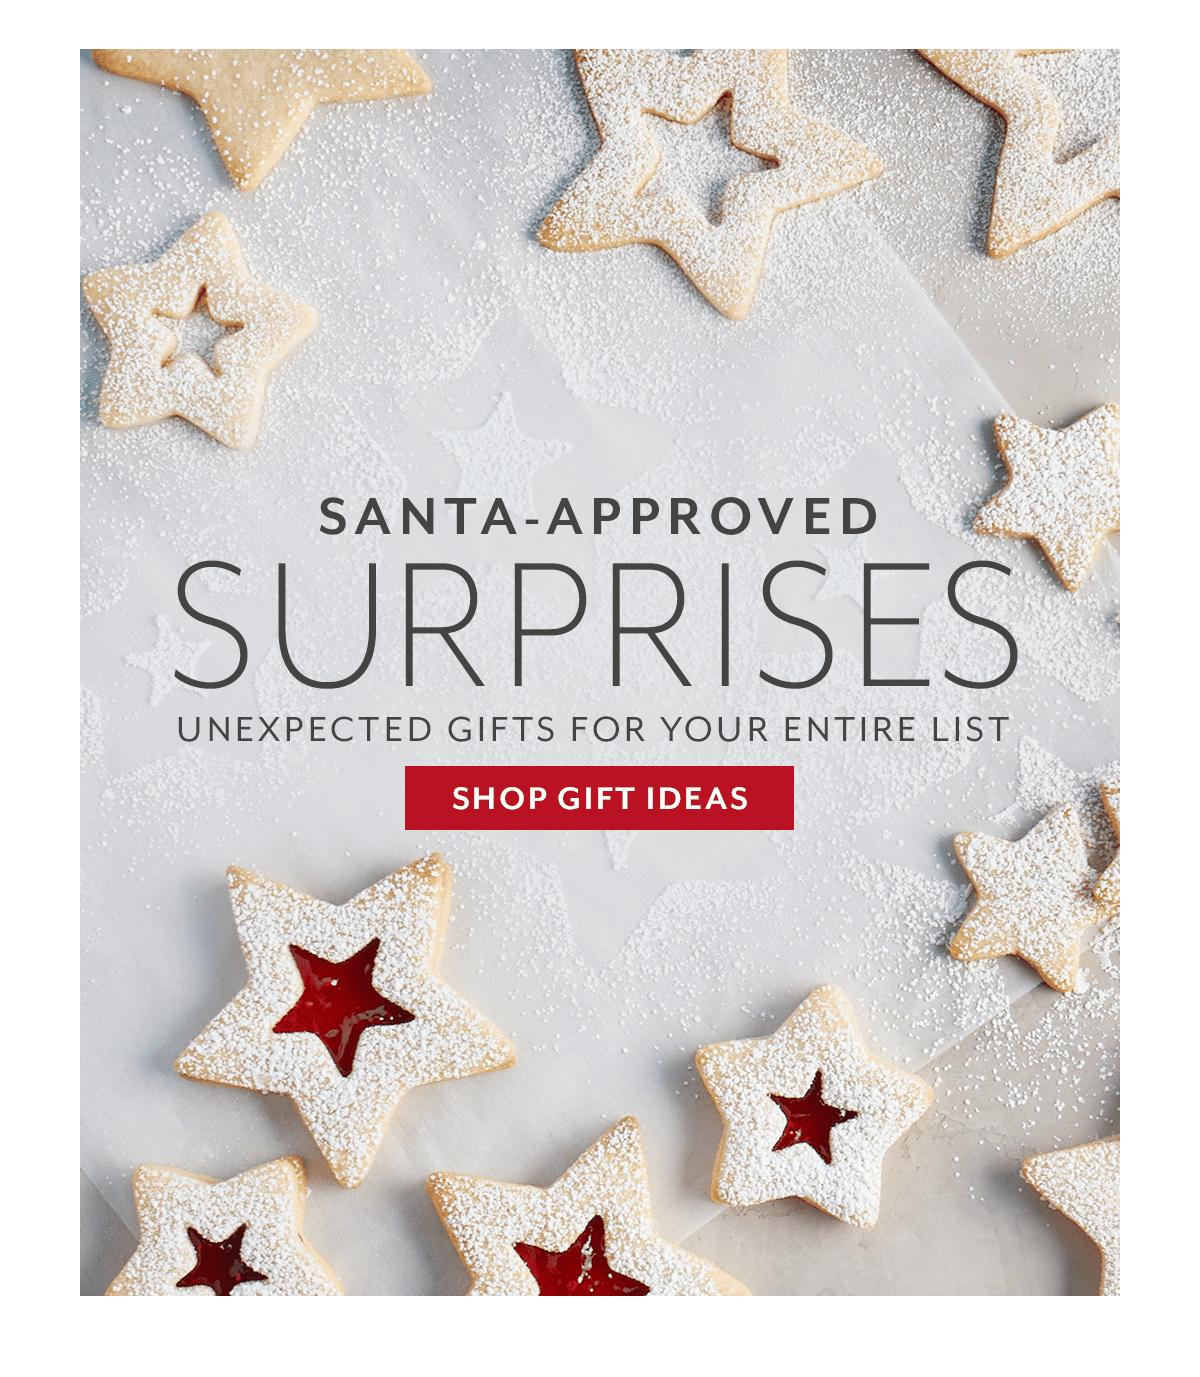 Santa-Approved Surprises